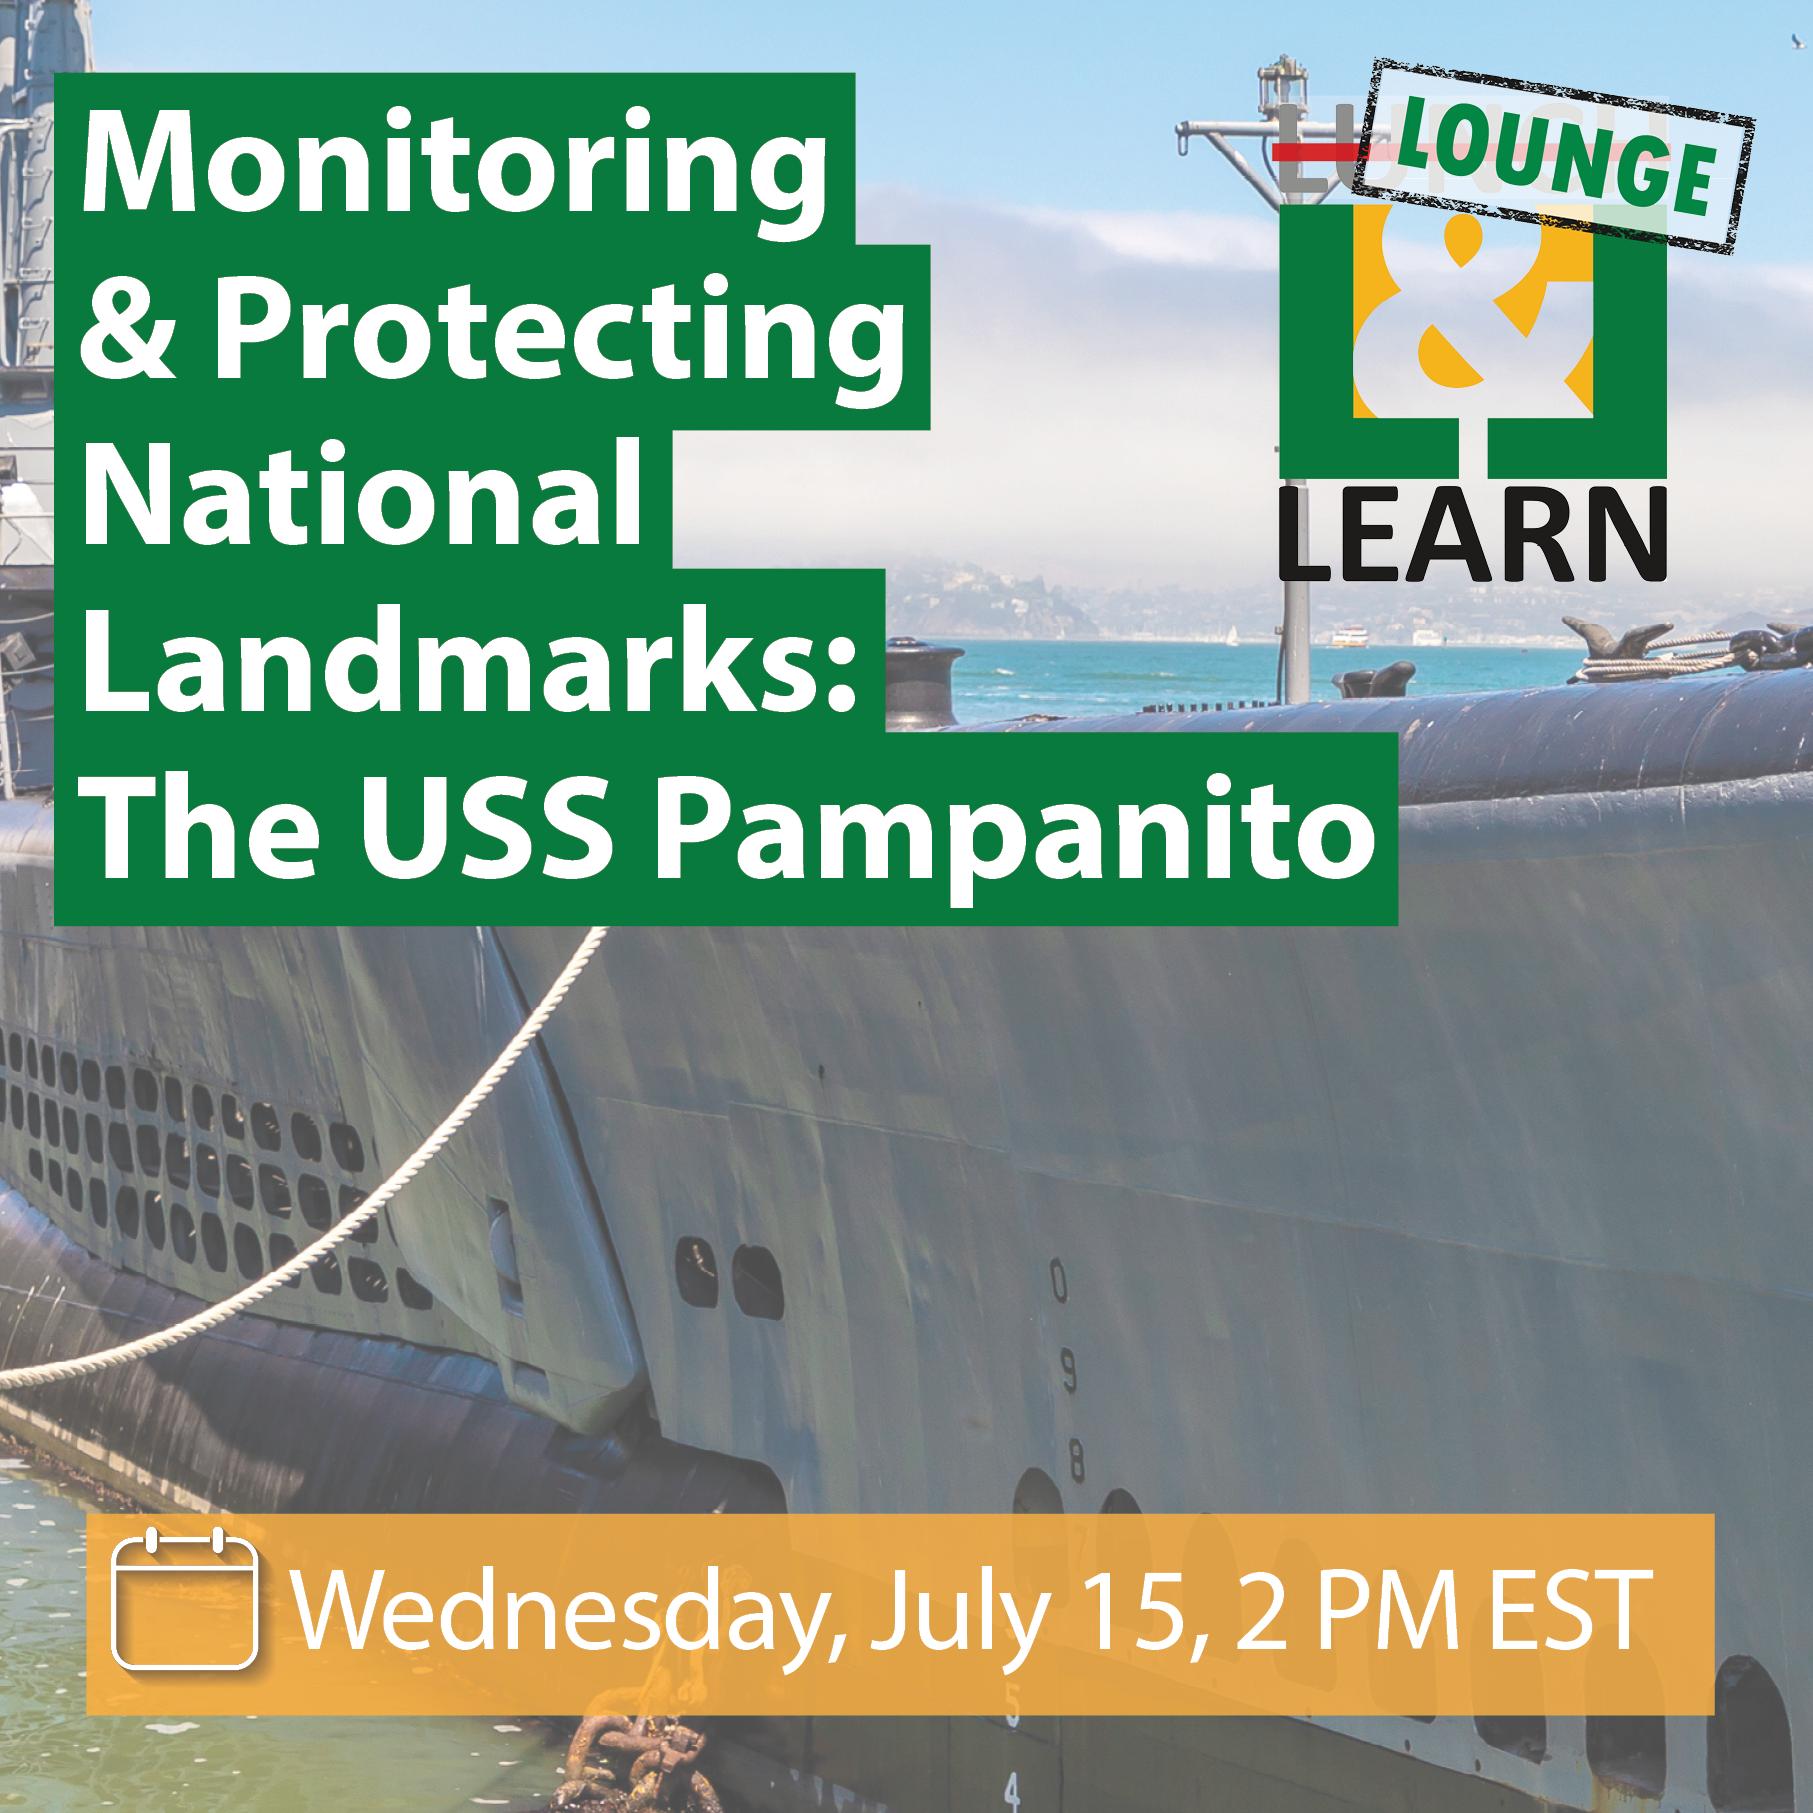 USS Pampanito Tour